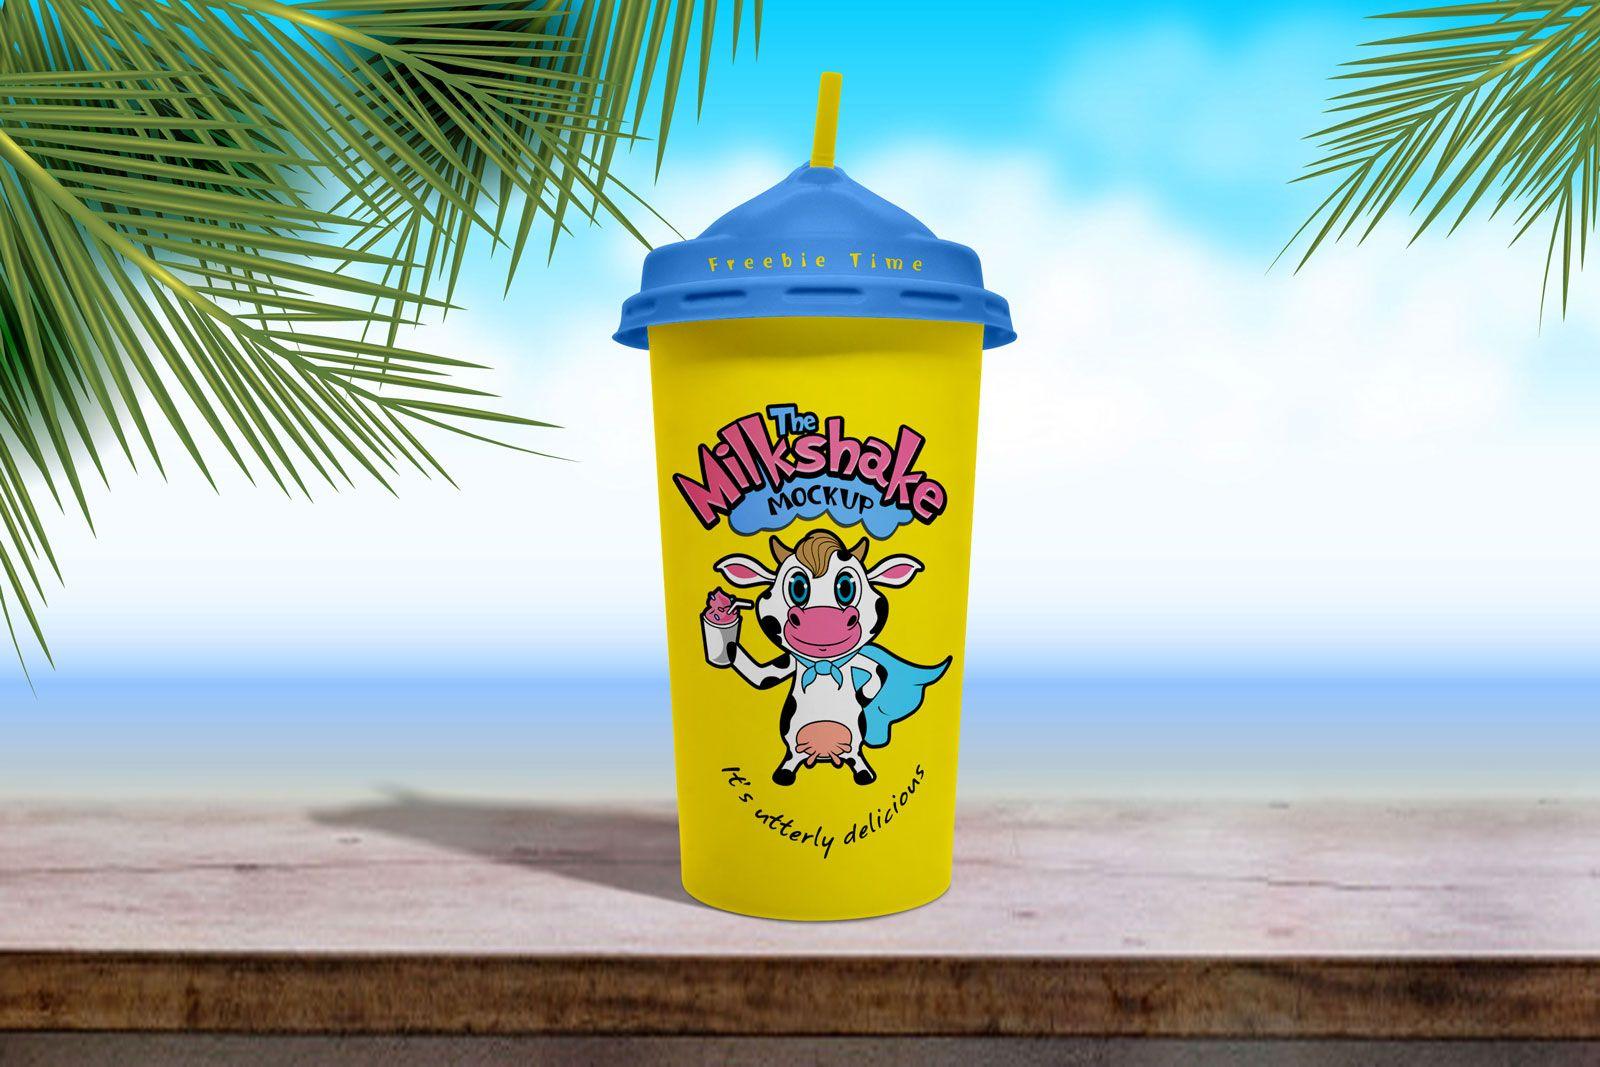 Free Disposable Milkshake Cup Mockup PSD in 2020 Free